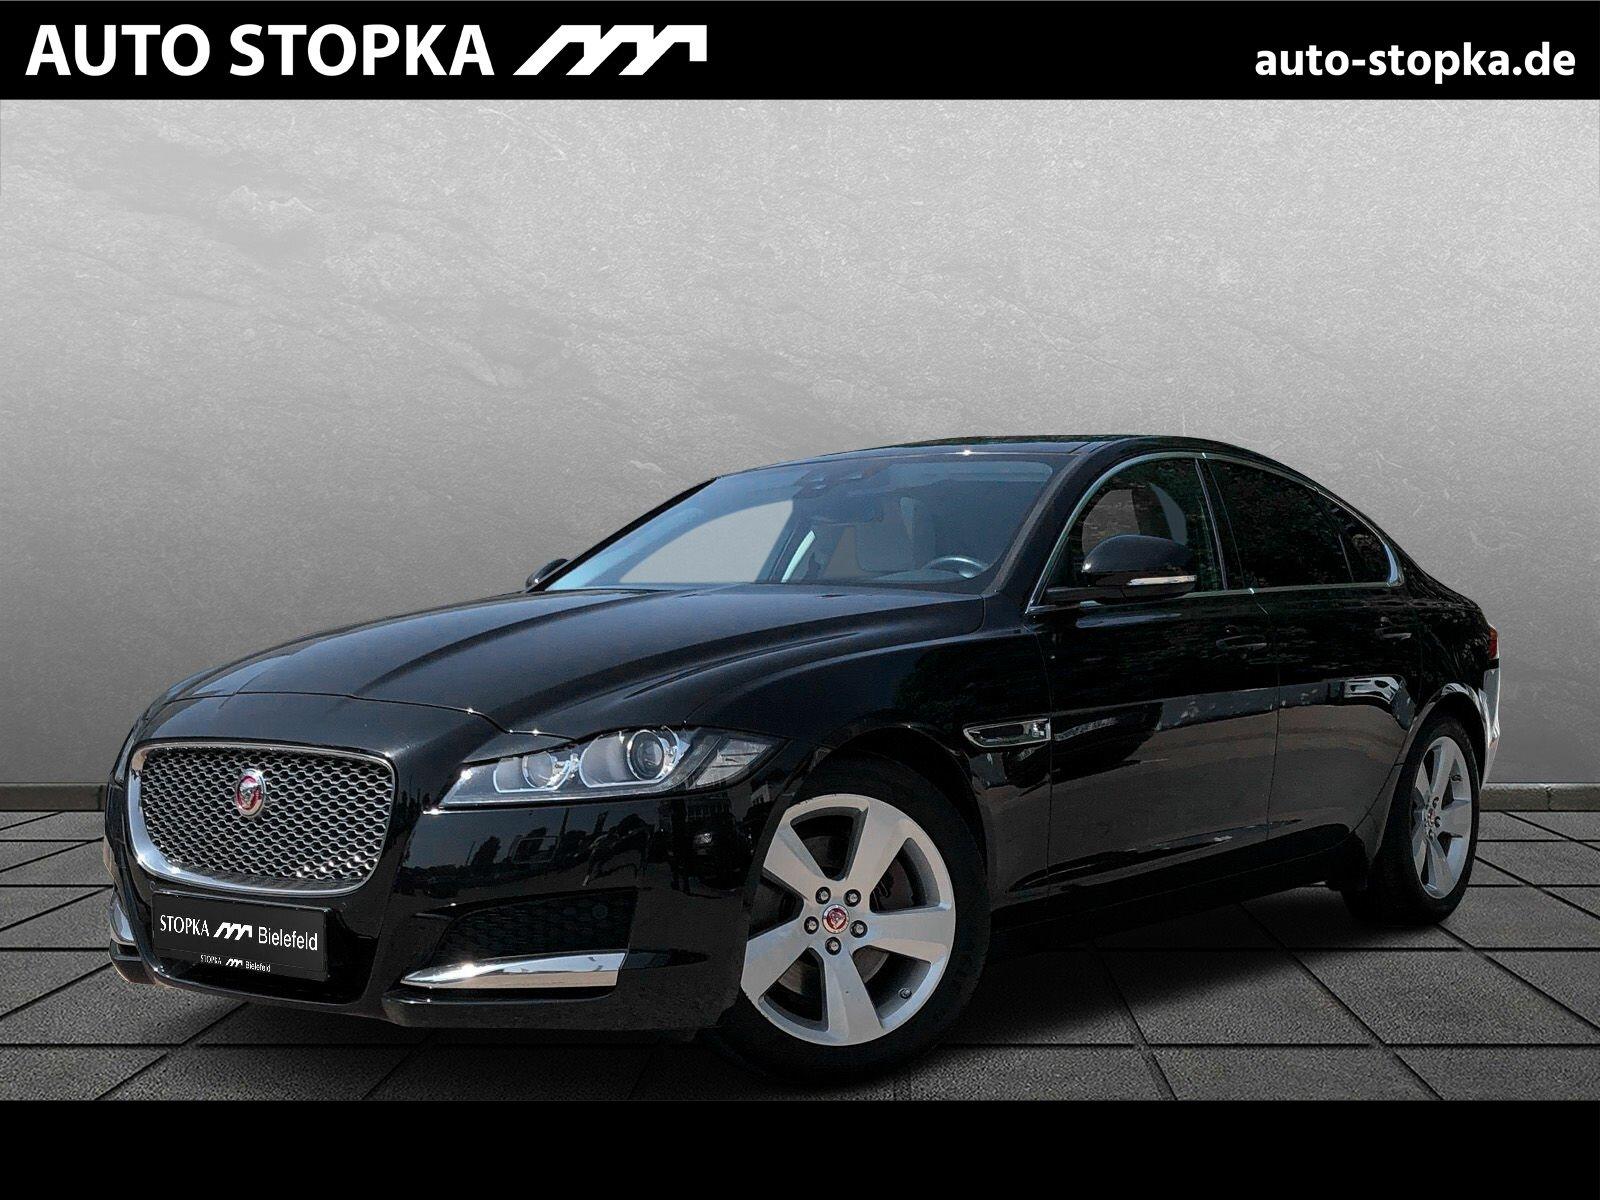 Jaguar XF 20d aut. Prestige *Schiebed.*Keyless*T-Winke*, Jahr 2016, Diesel